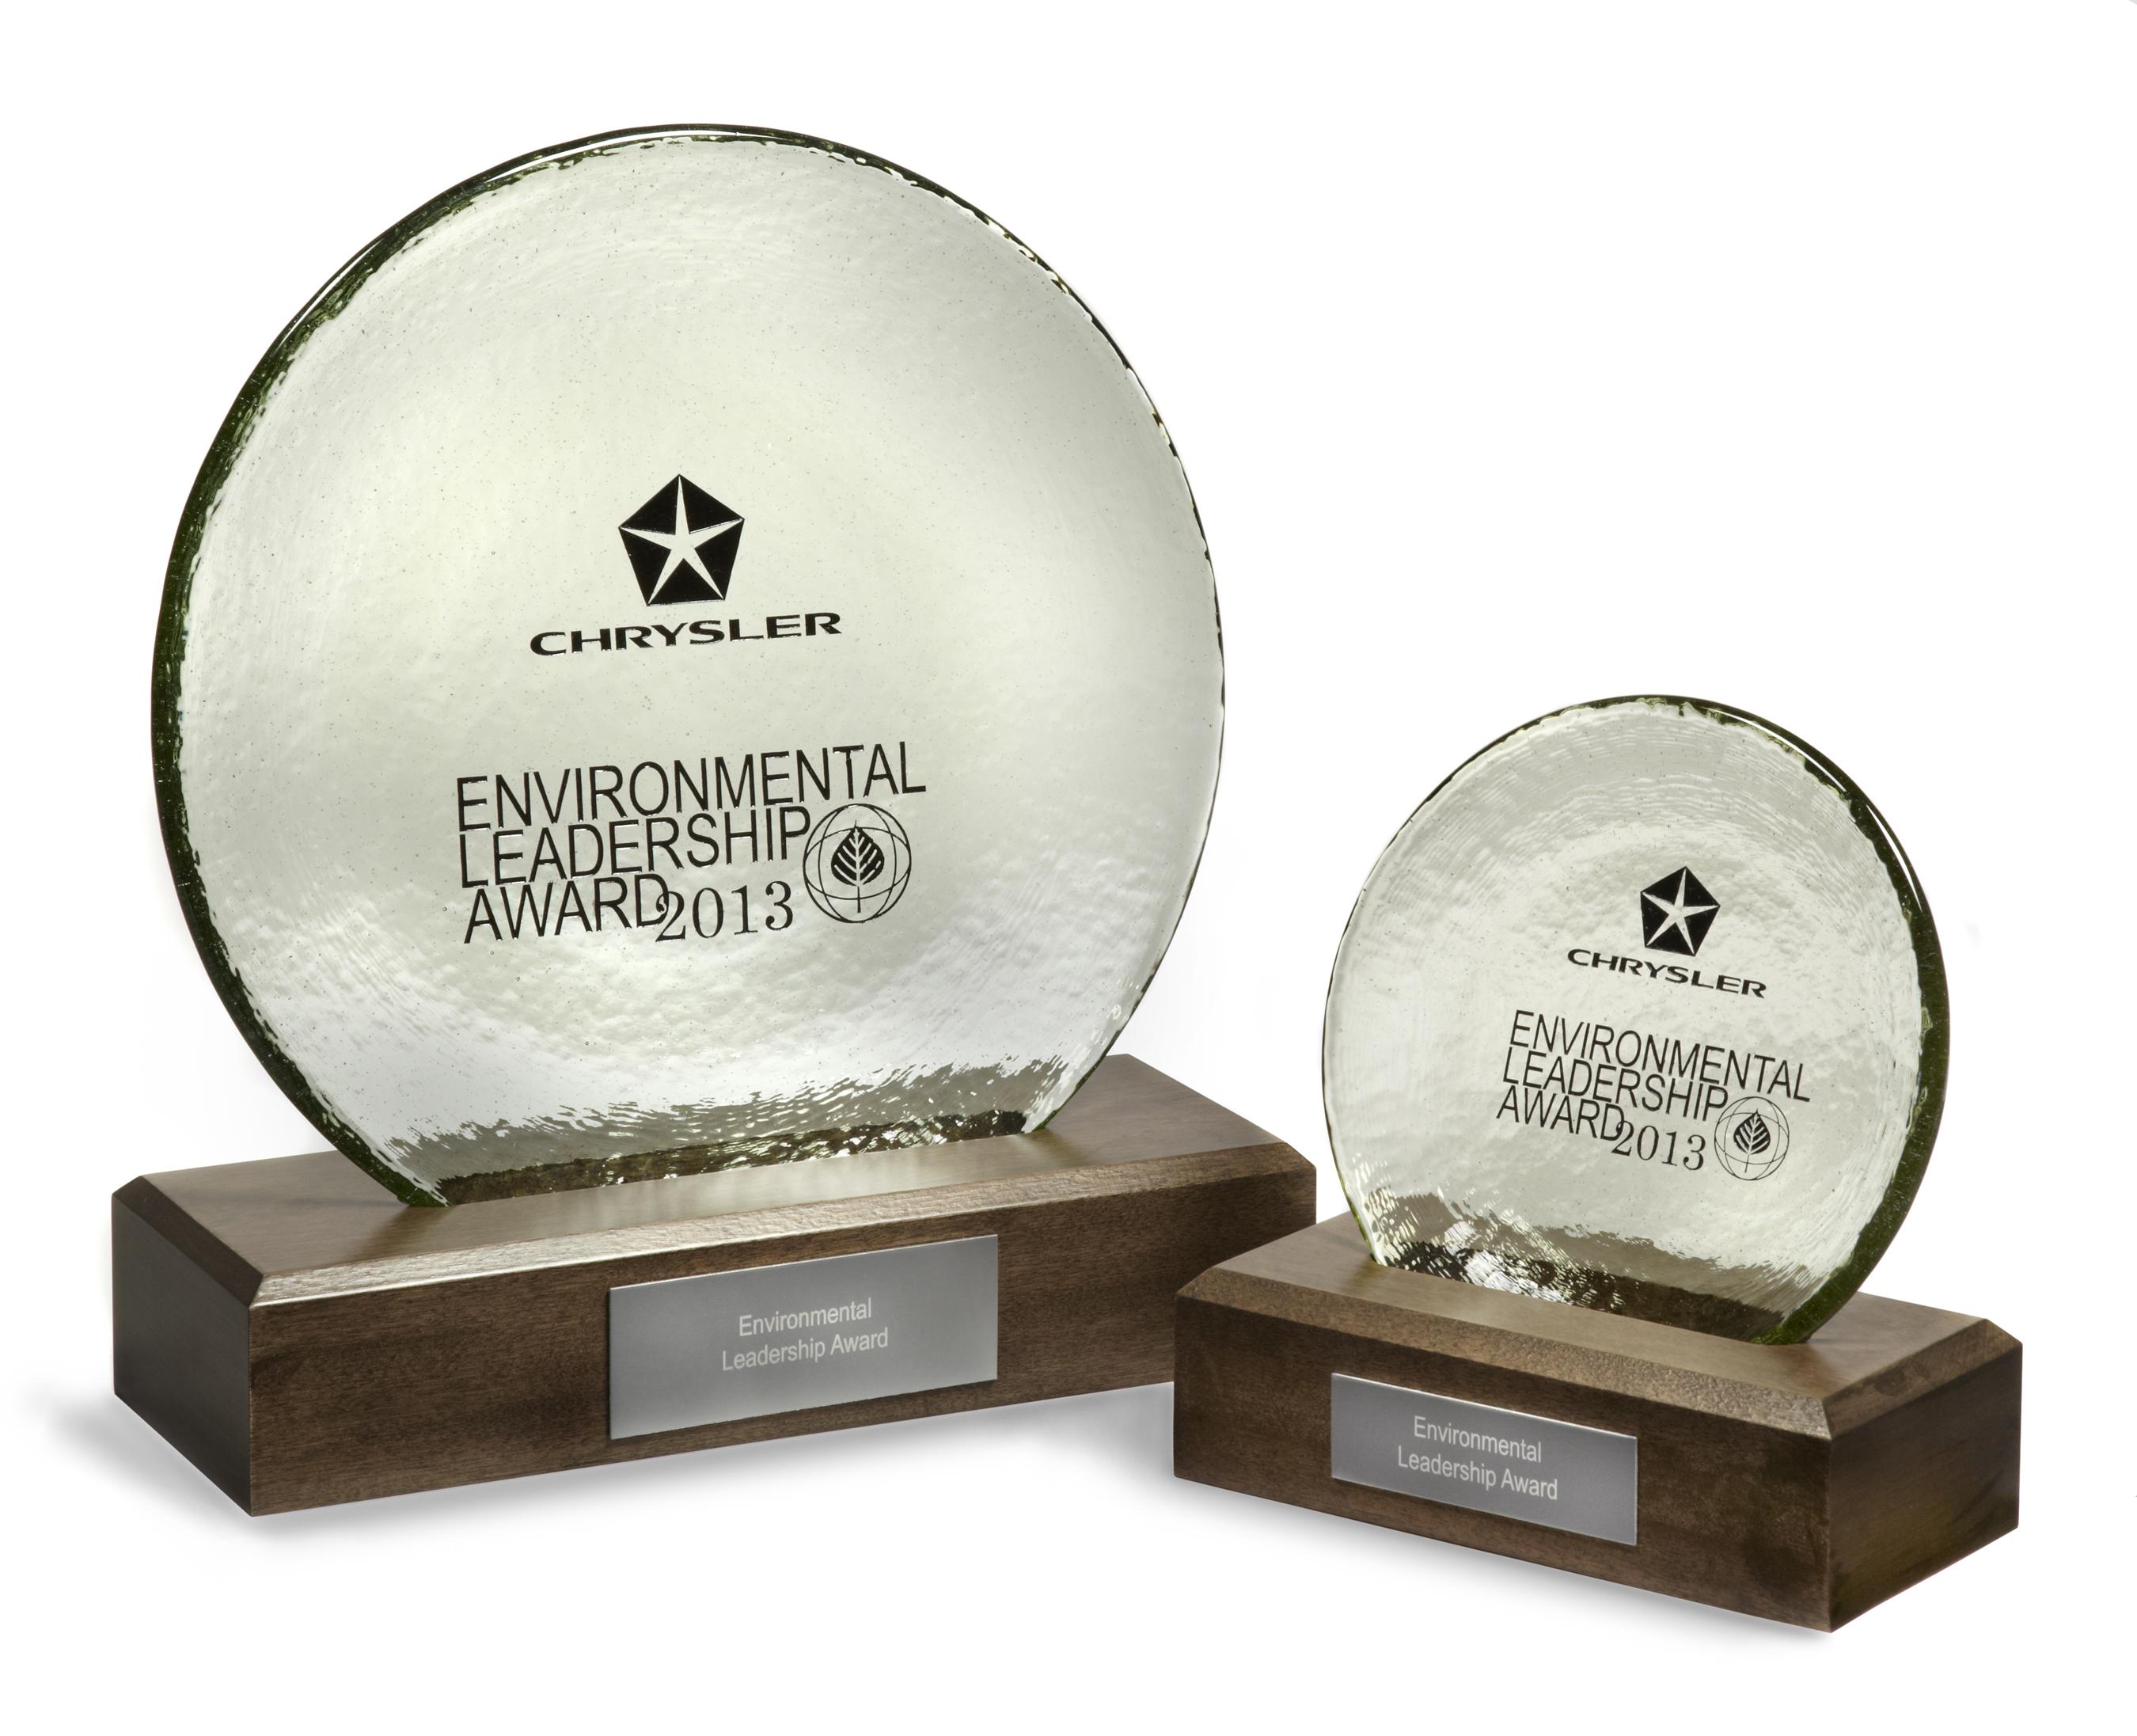 eco-friendly corporate award